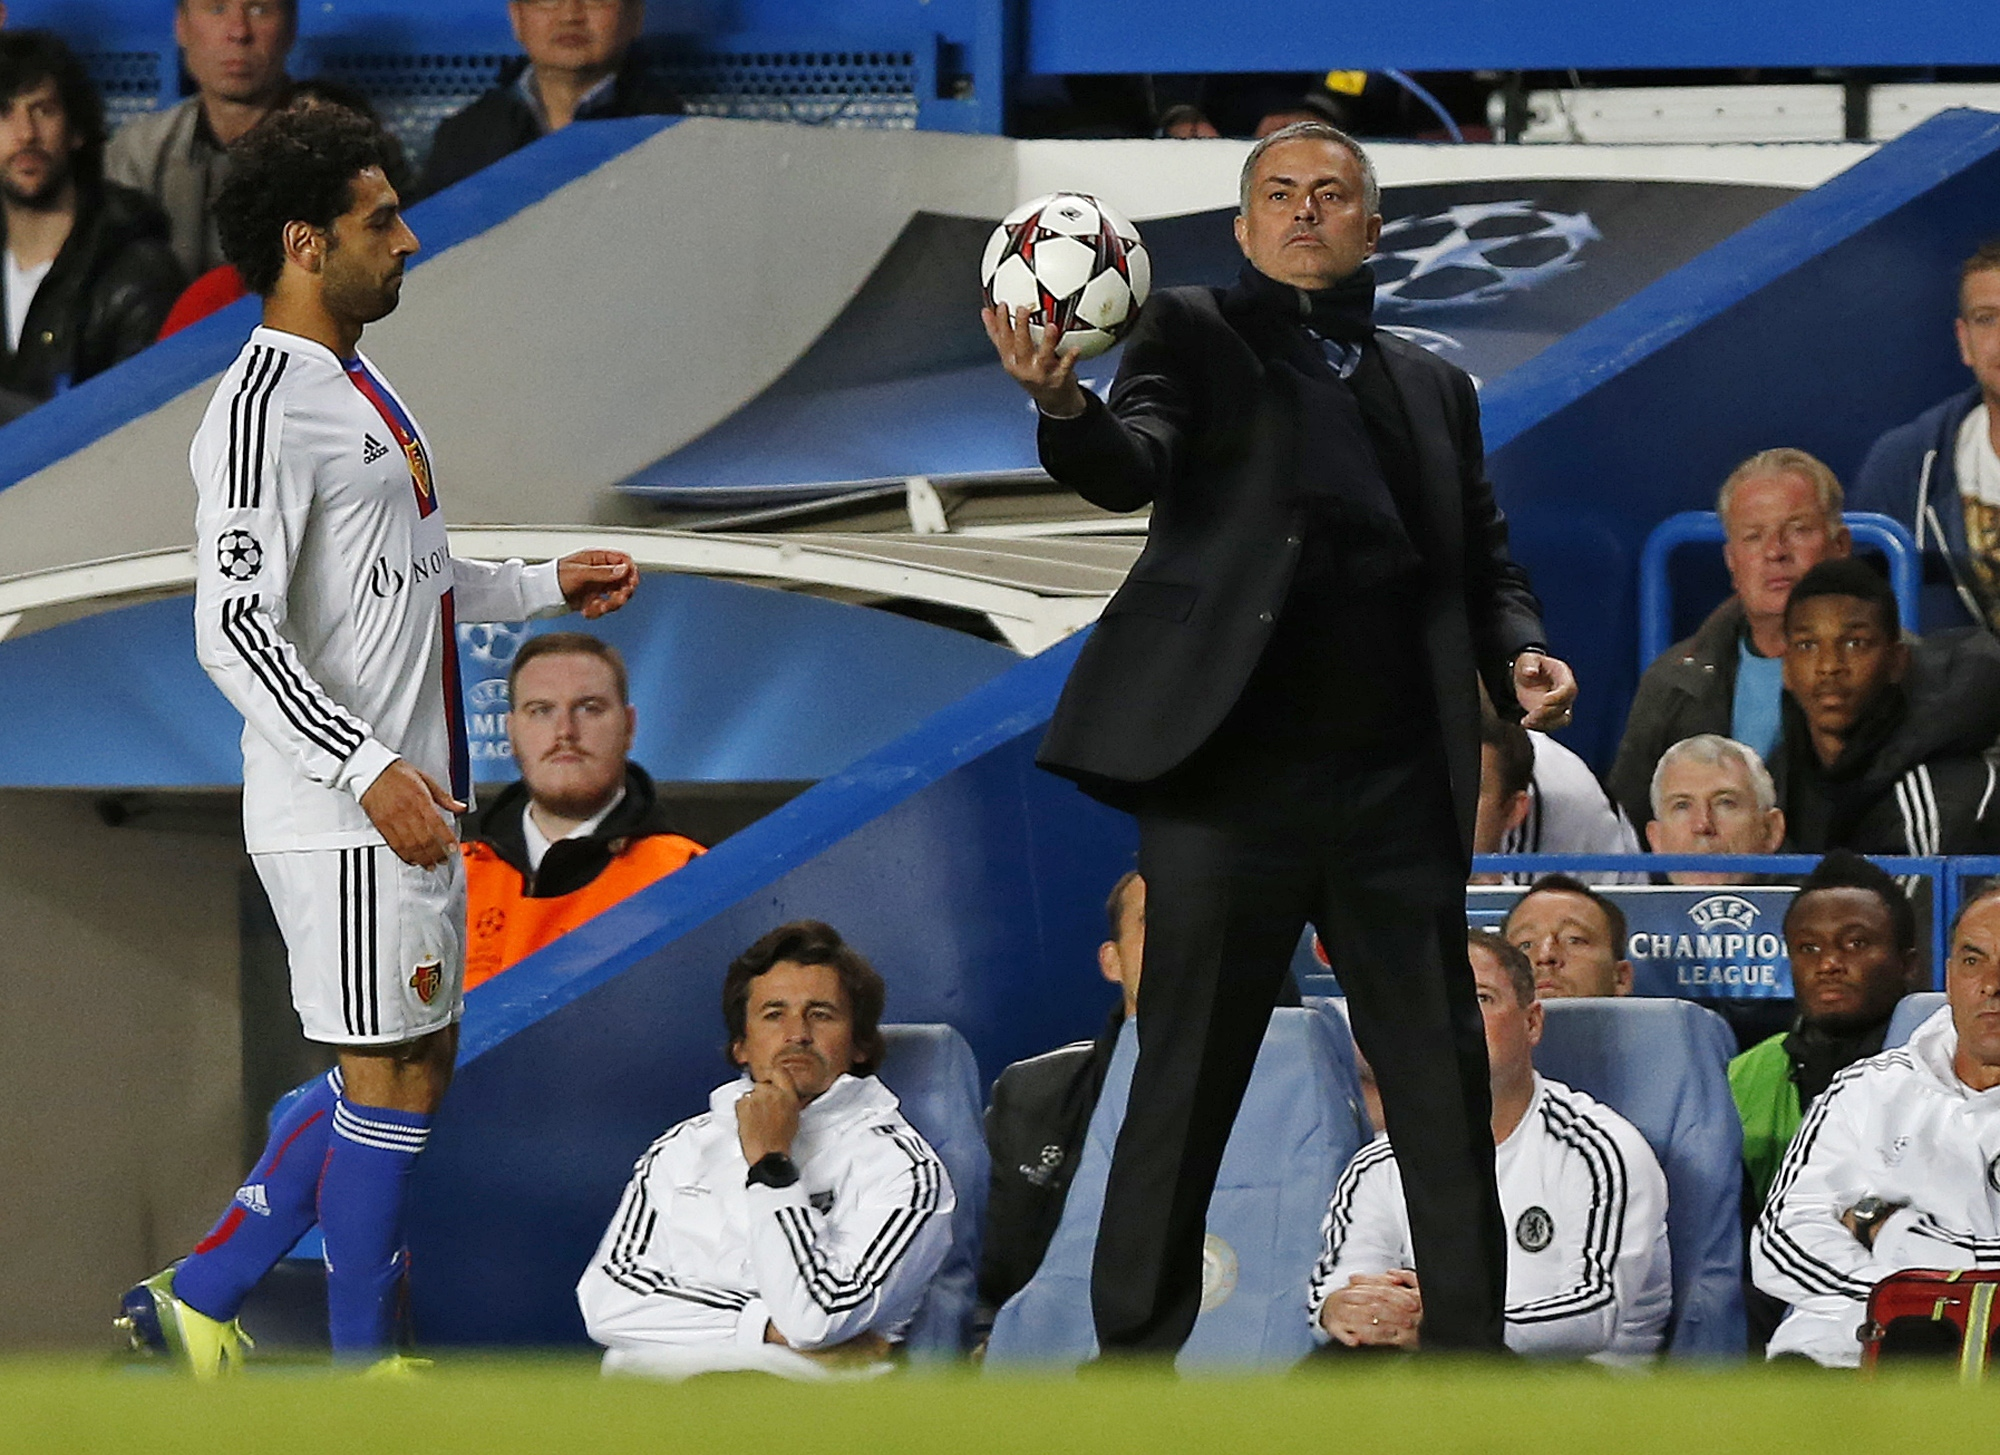 «Челси» согласовал с «Базелем» детали трансфера Сала